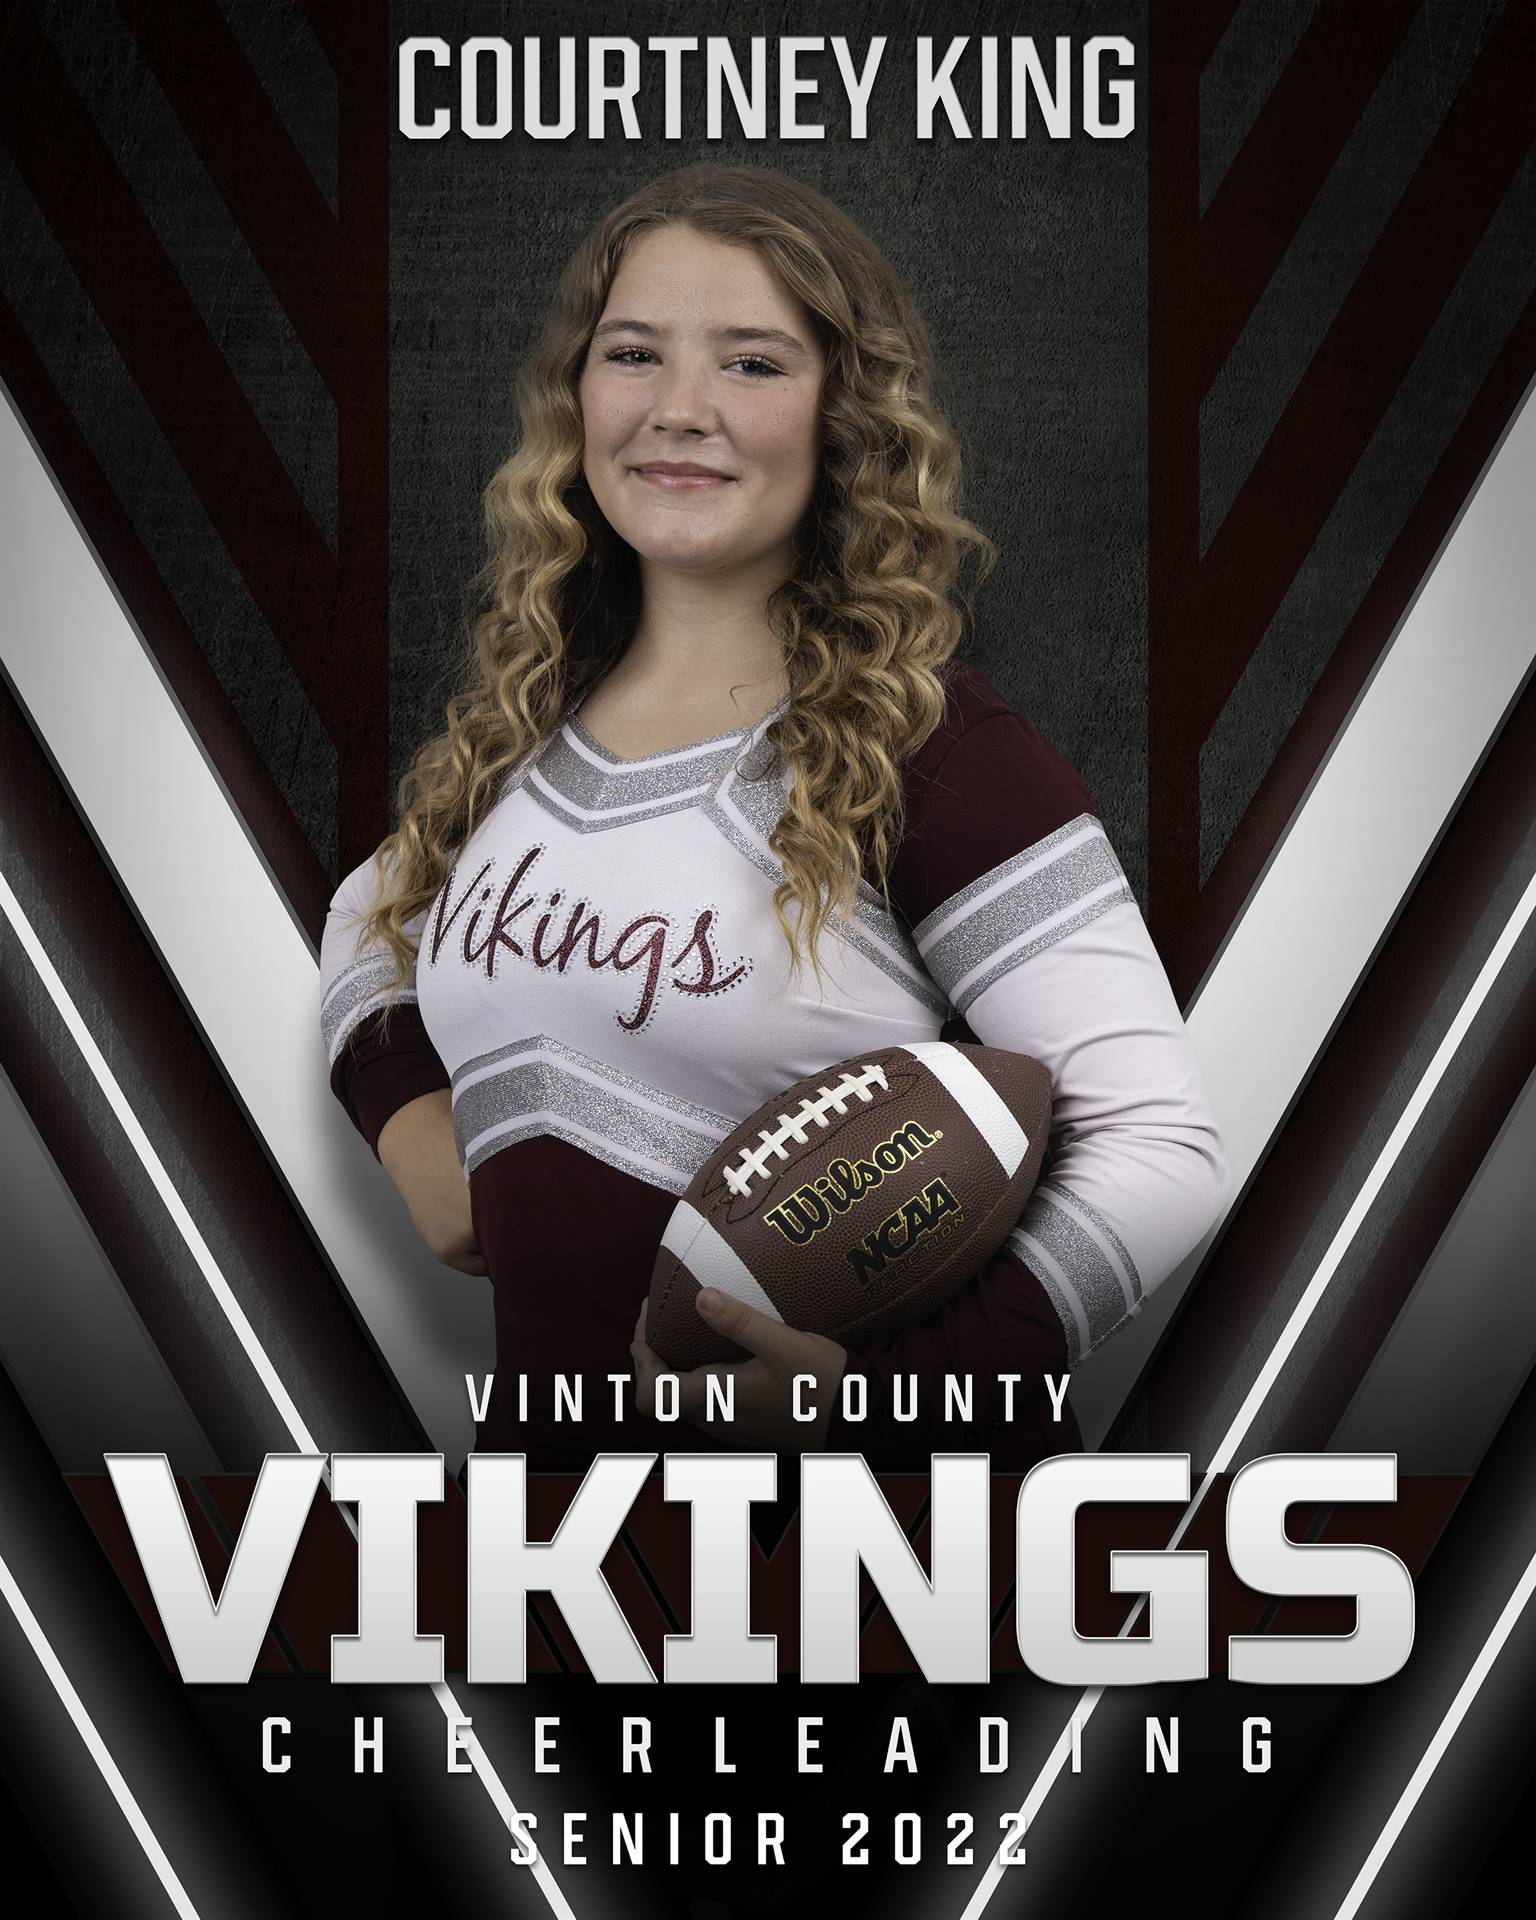 Courtney King - Cheerleading